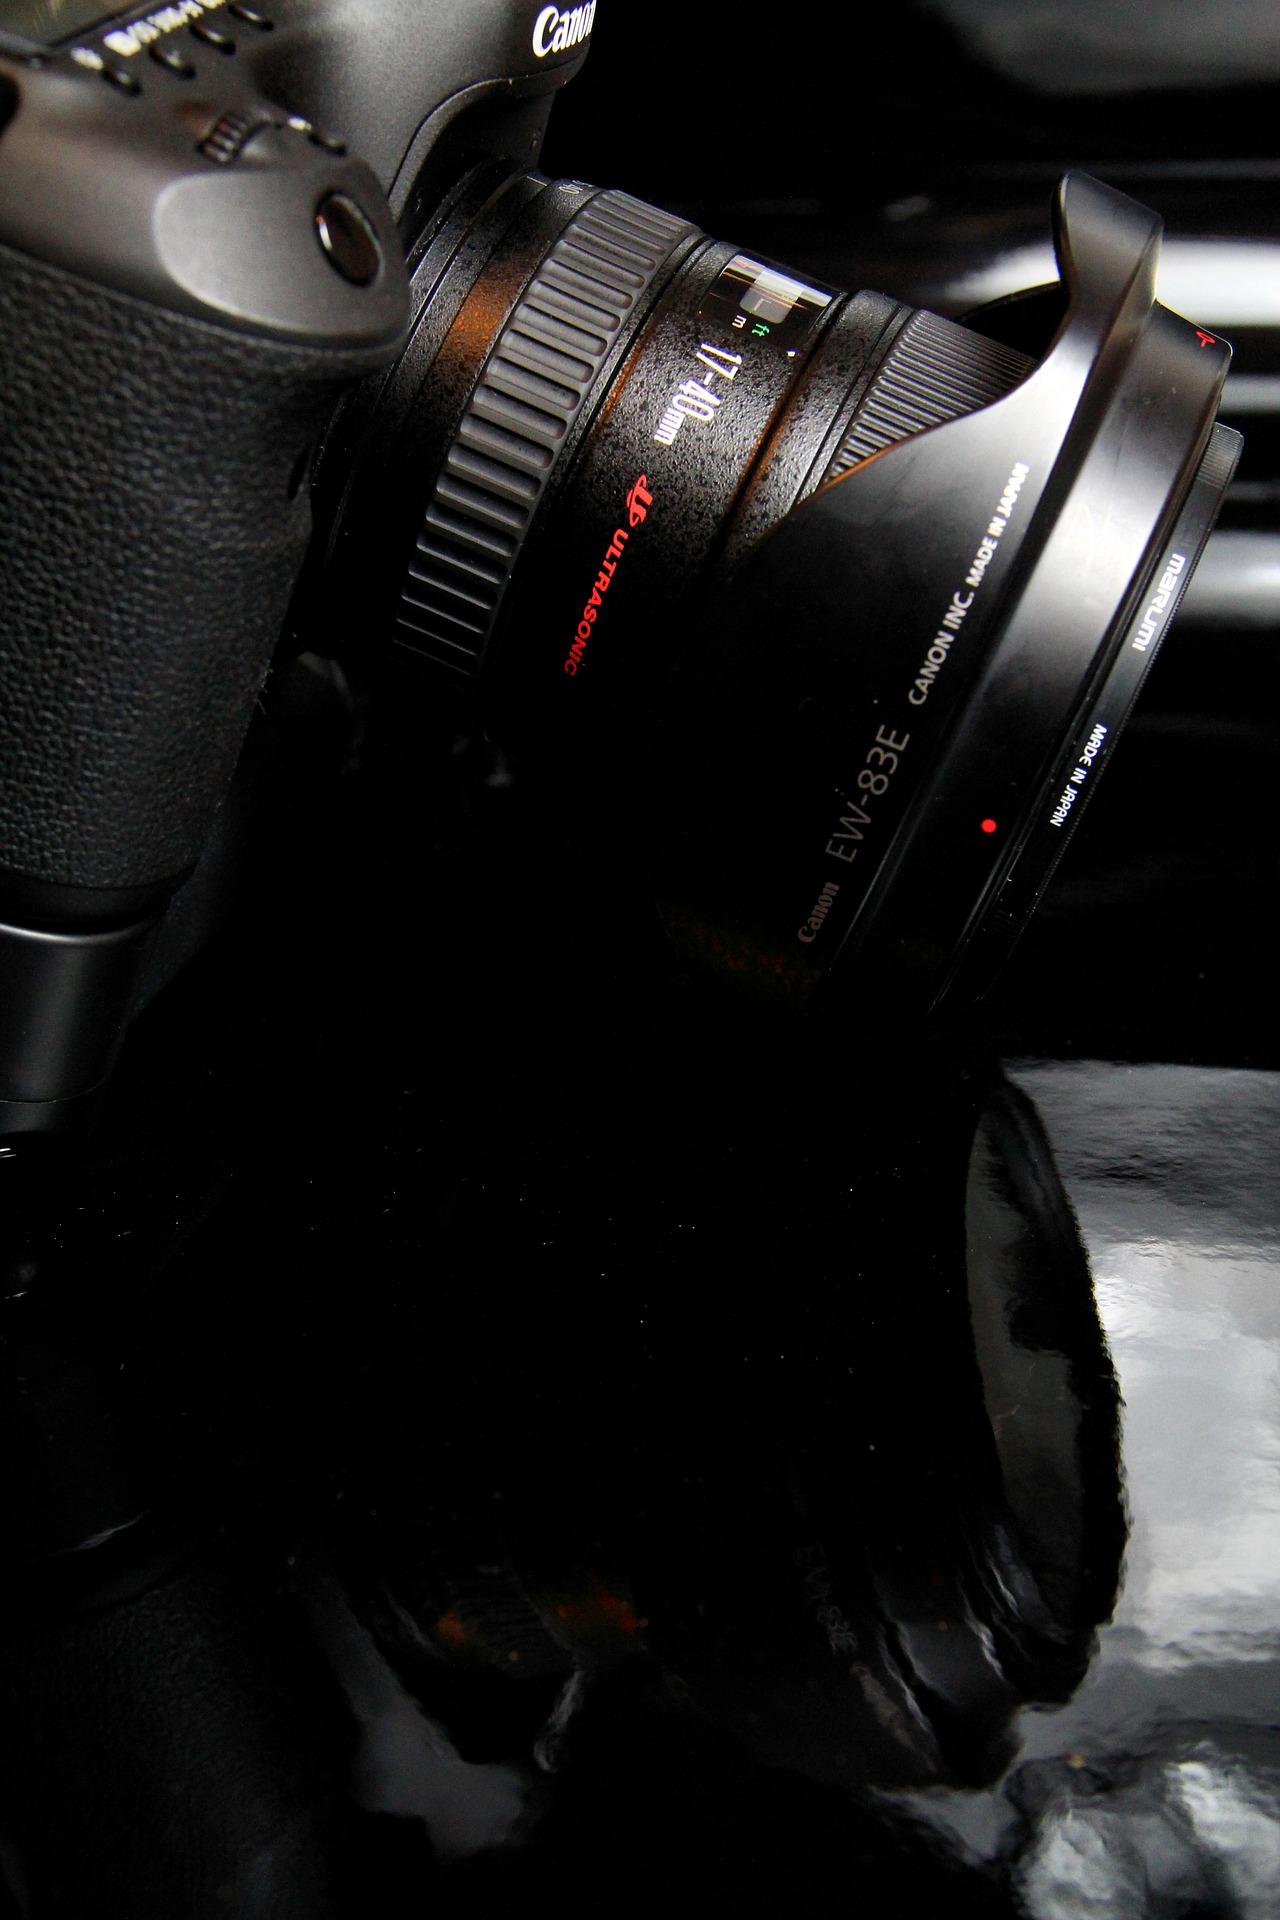 Canon 5d mark iv content creatie video videografie fotografie - RSDesigns